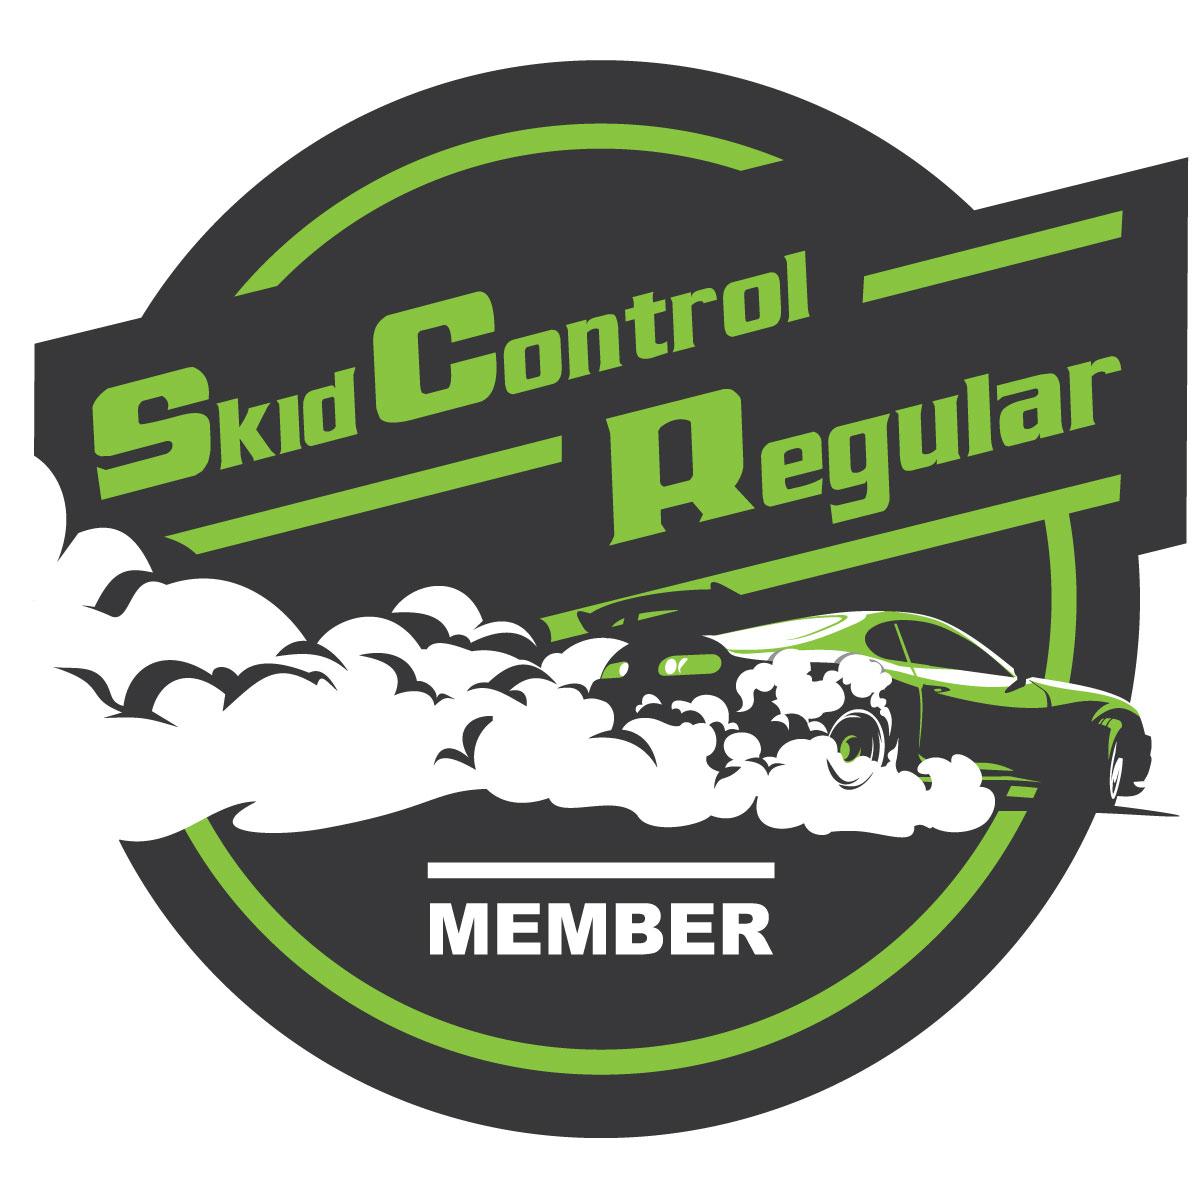 Skid Control Regular